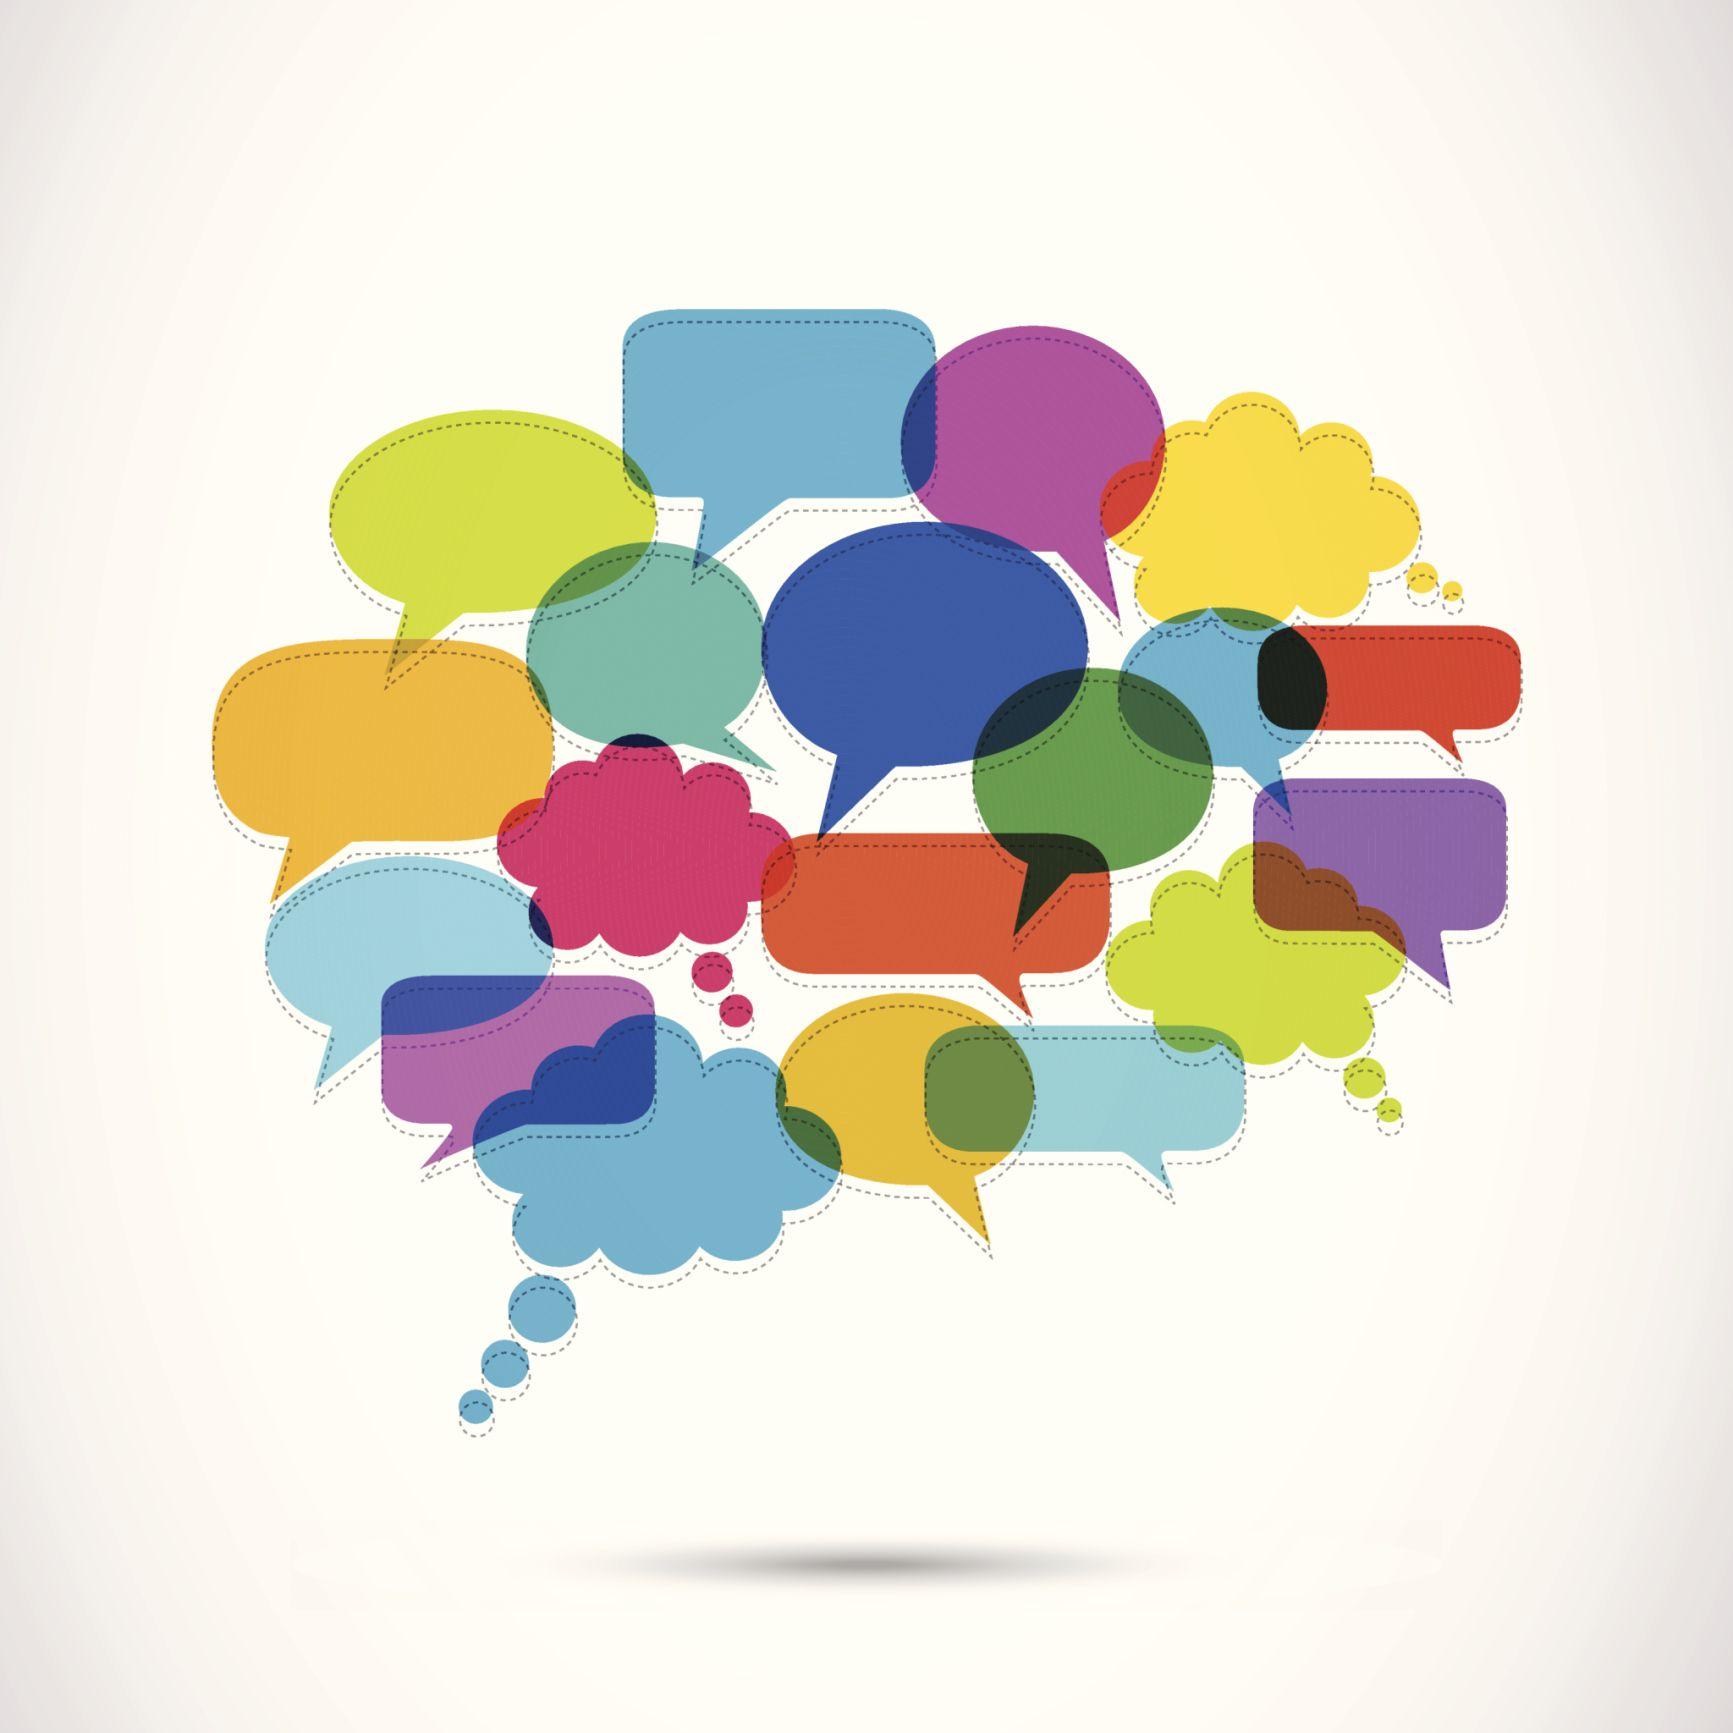 Social Media Lead Generation 5 Ways To Succeed